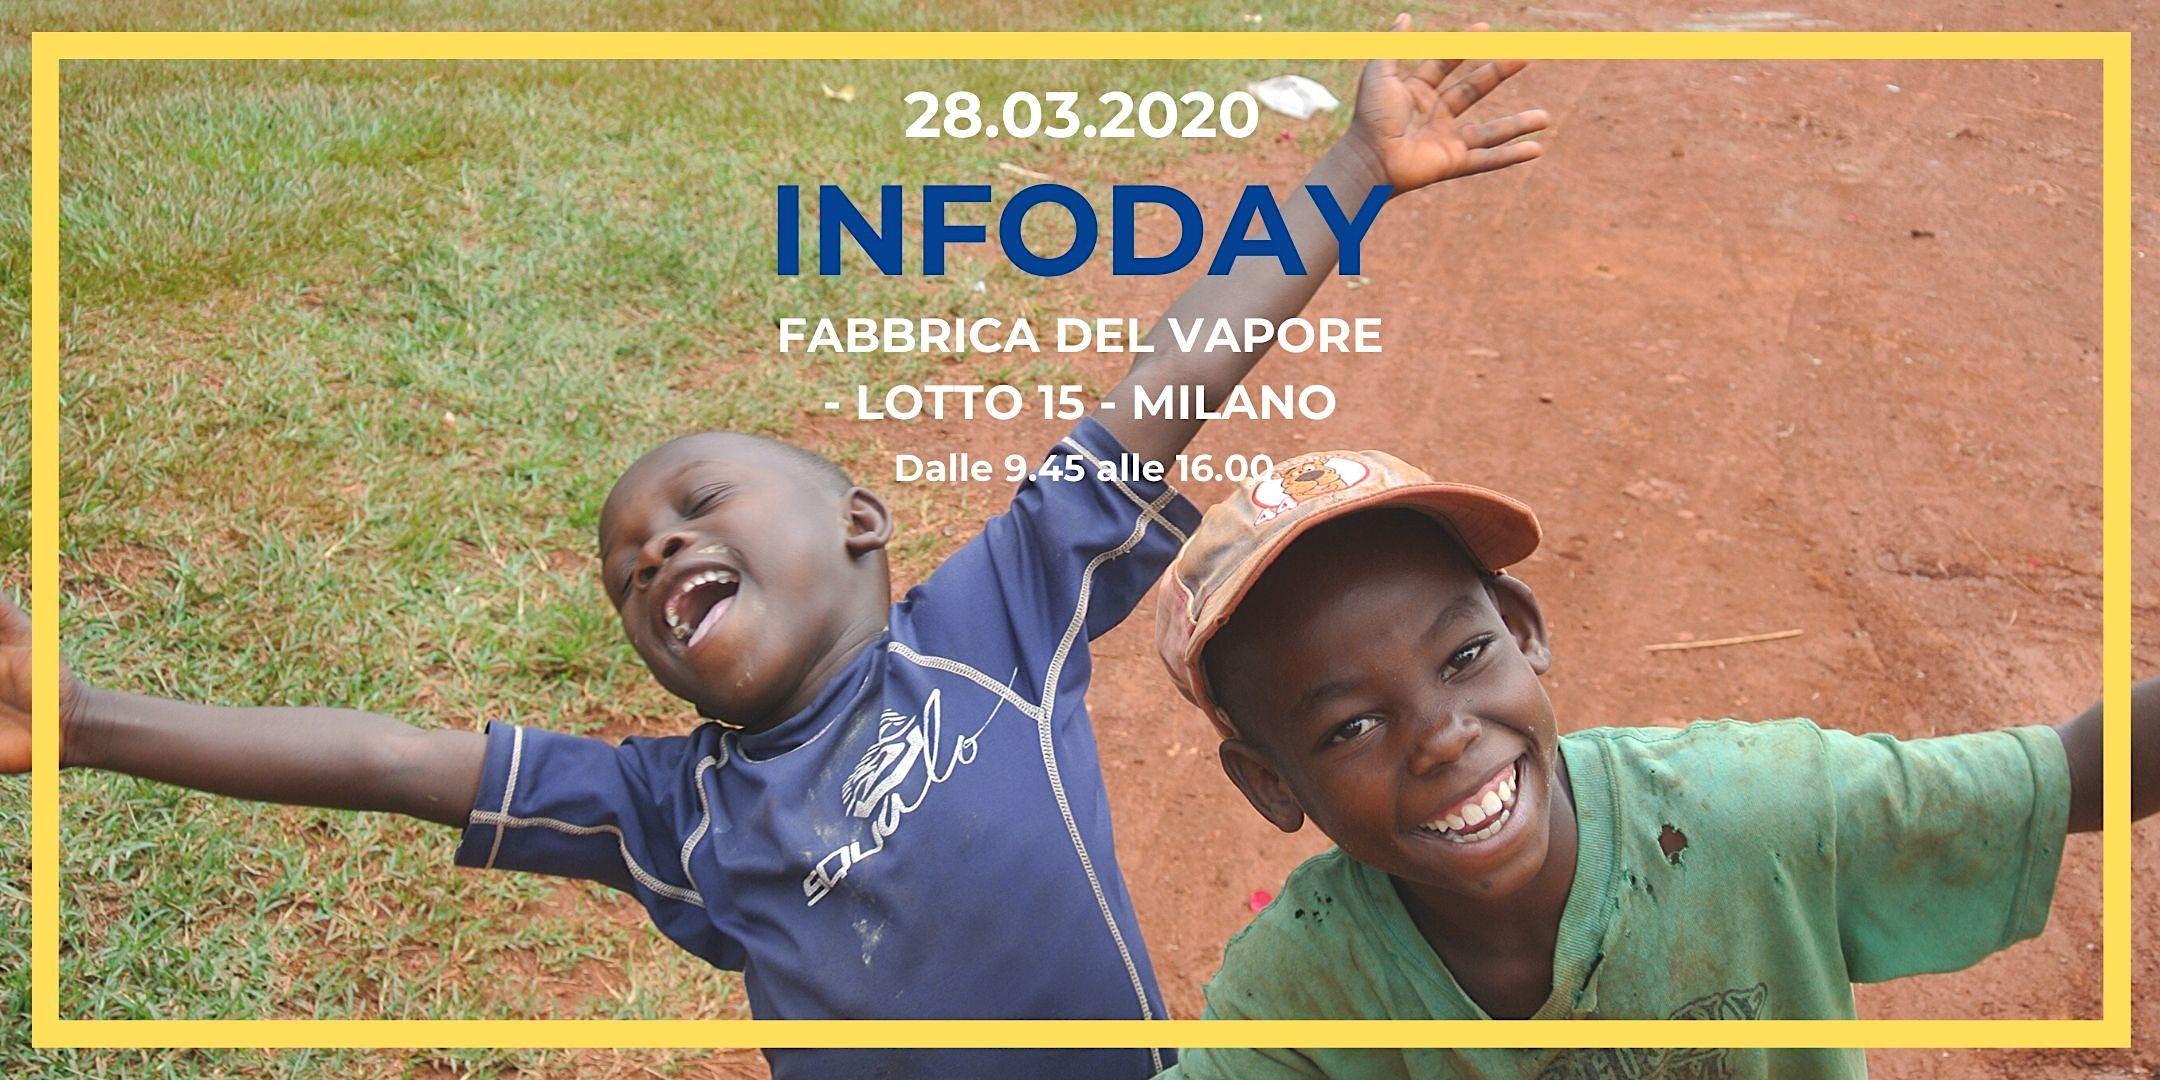 INFODAY- Parti come volontario all'estero!